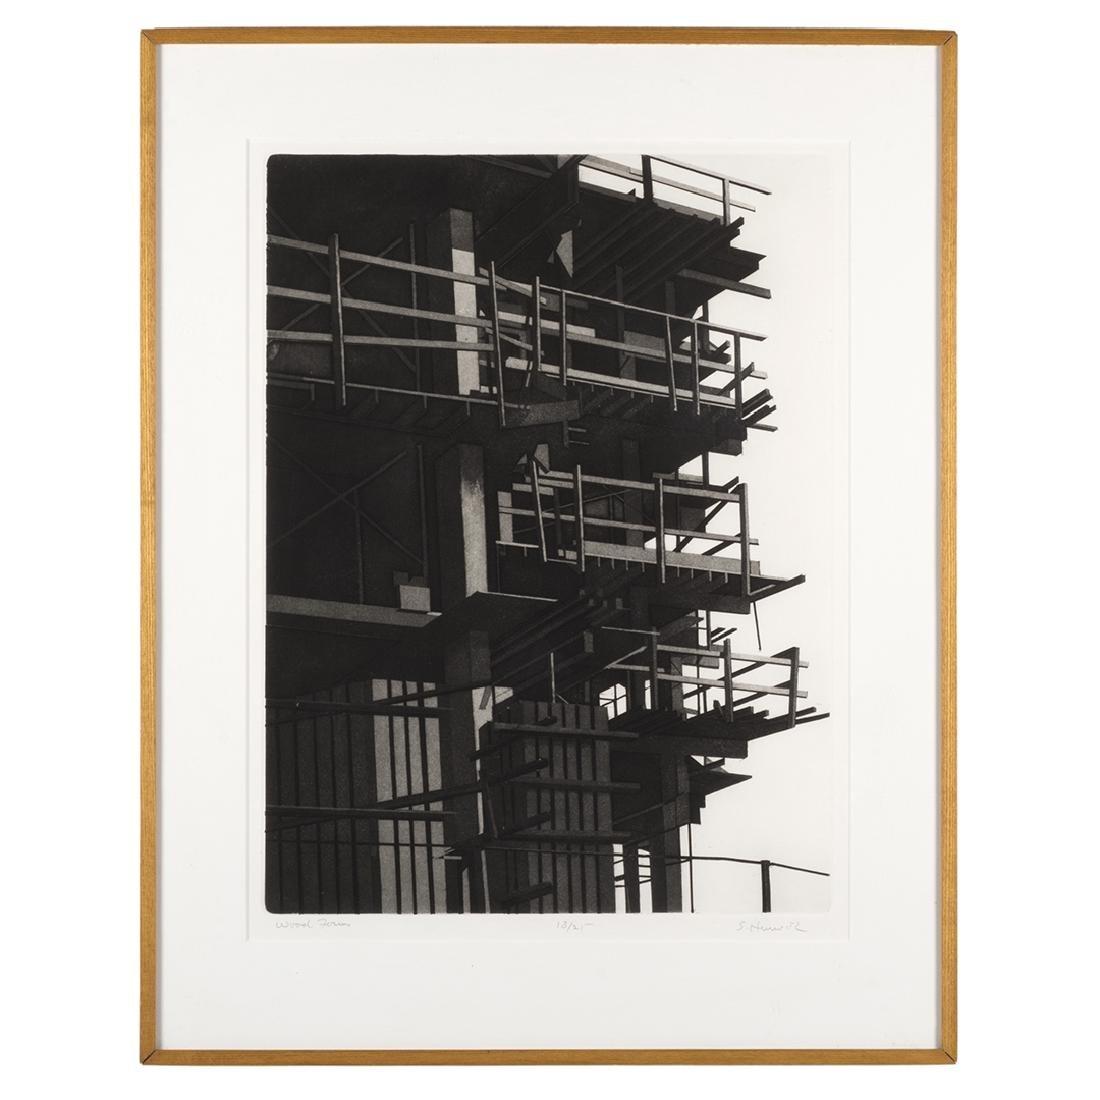 Etching by S. Hurwitz